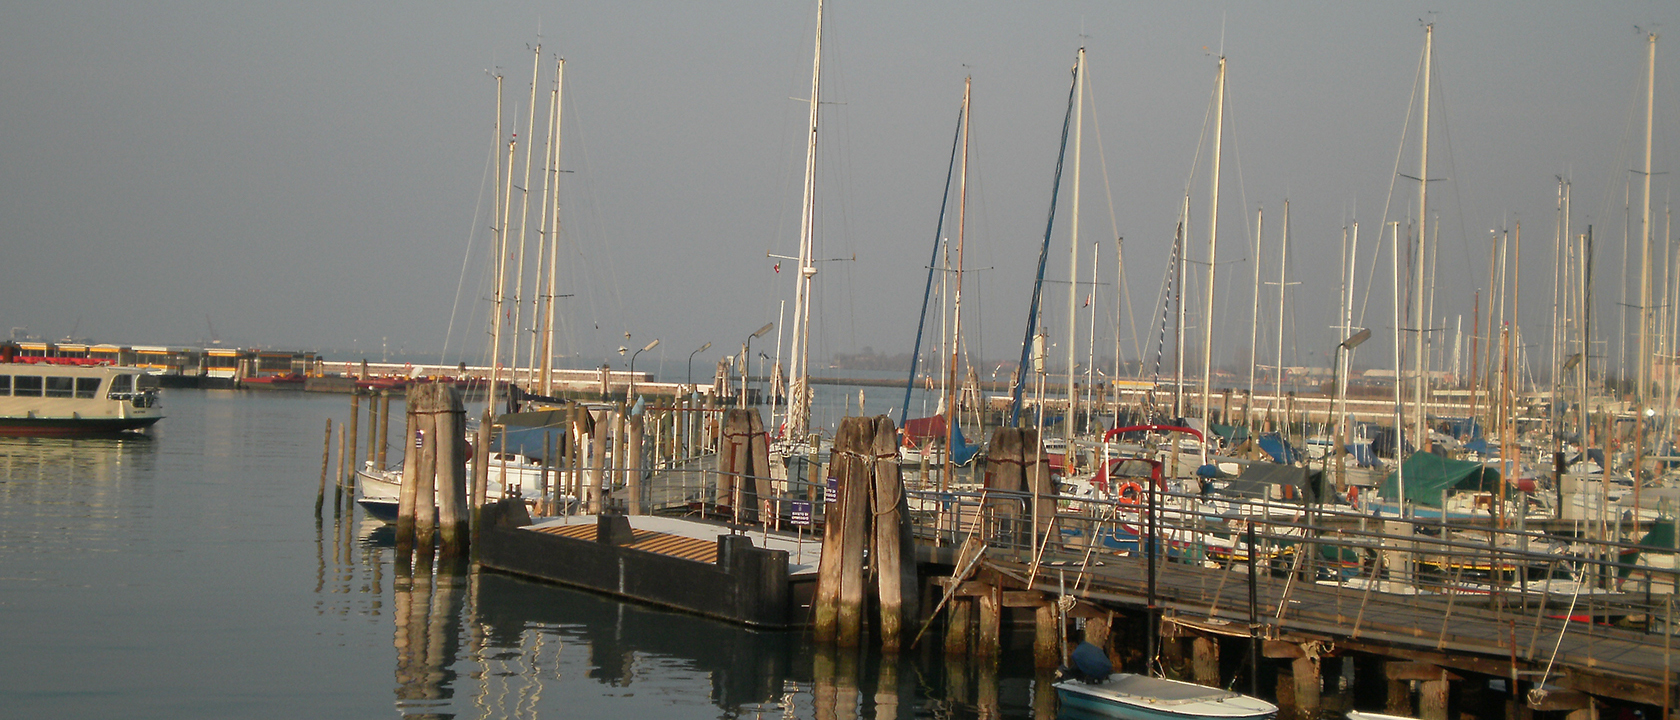 Aqua - Jachthafen Diporto Velico Veneziano